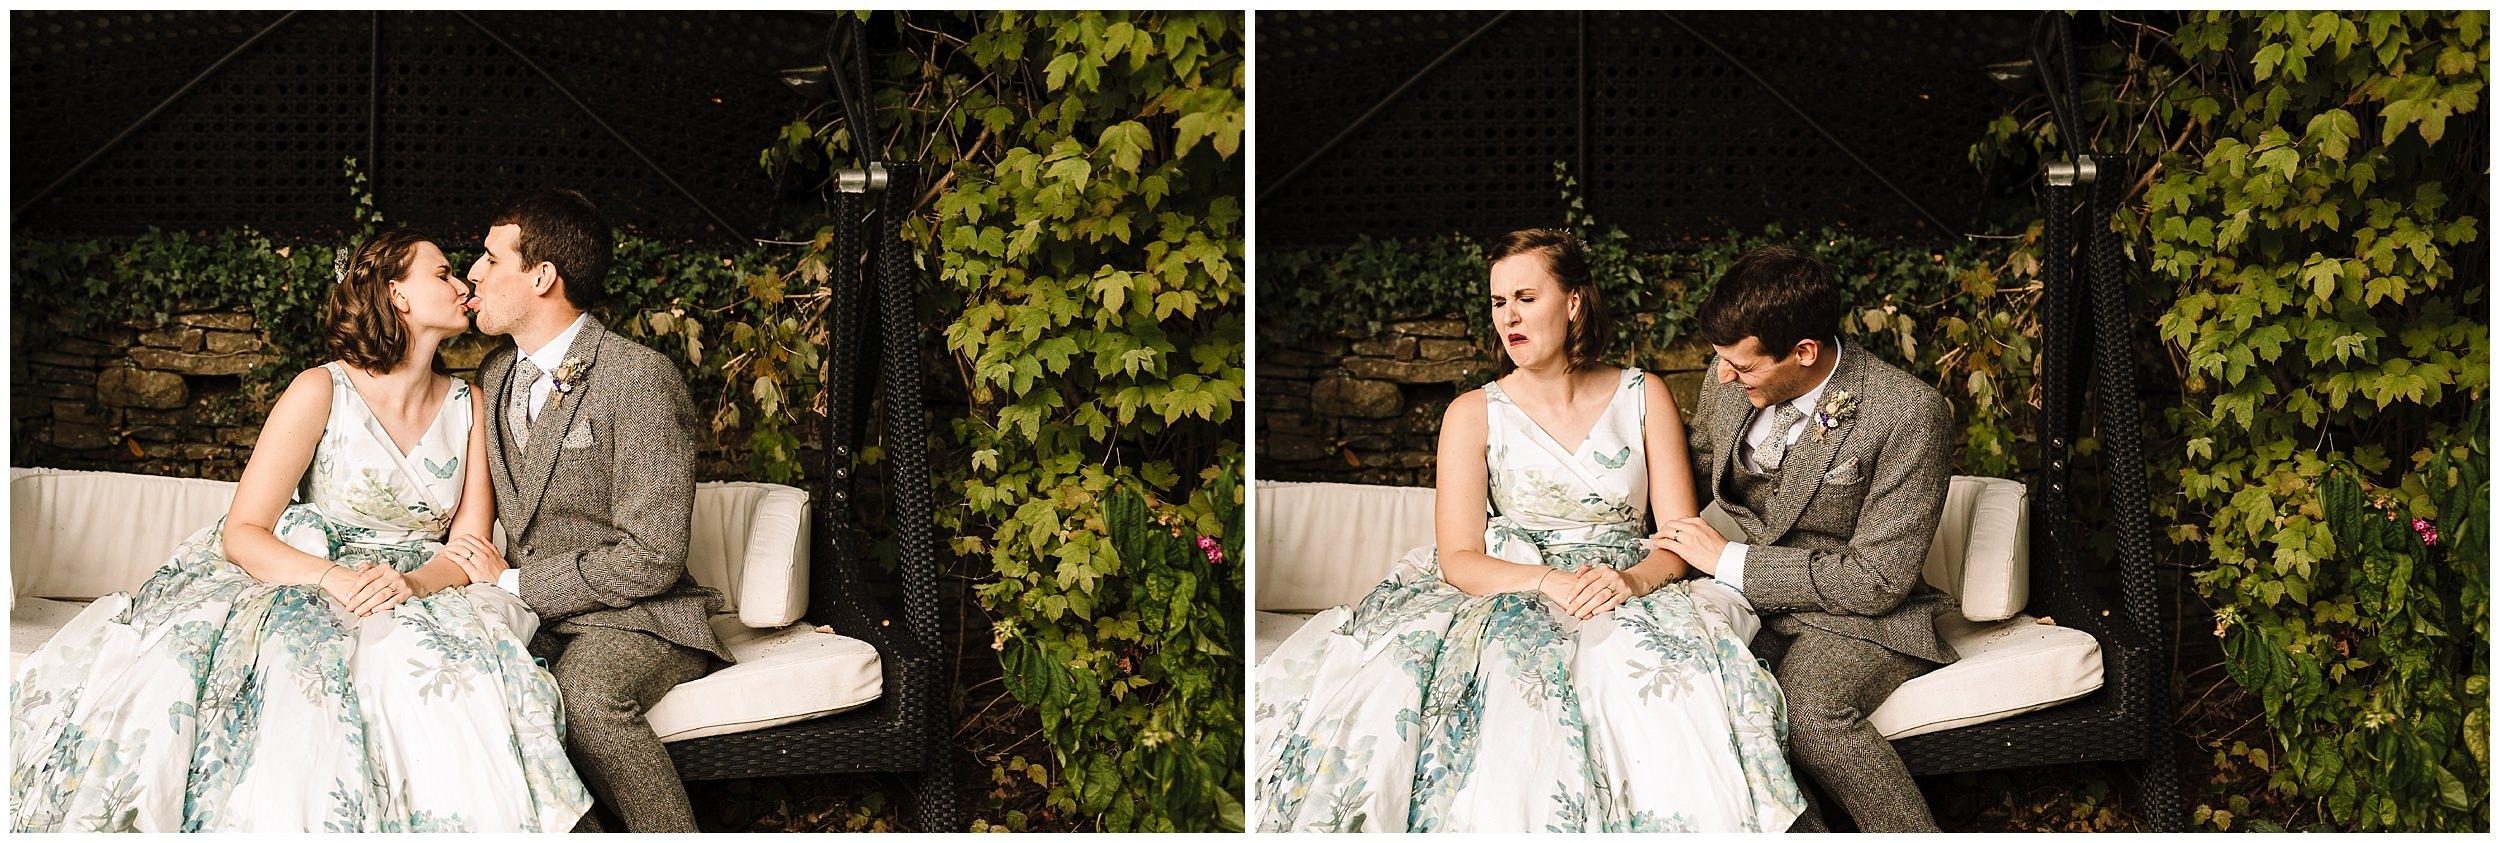 YORKSHIRE OUTDOOR WEDDING PHOTOGRAPHER LUCY ALEX_0029.jpg